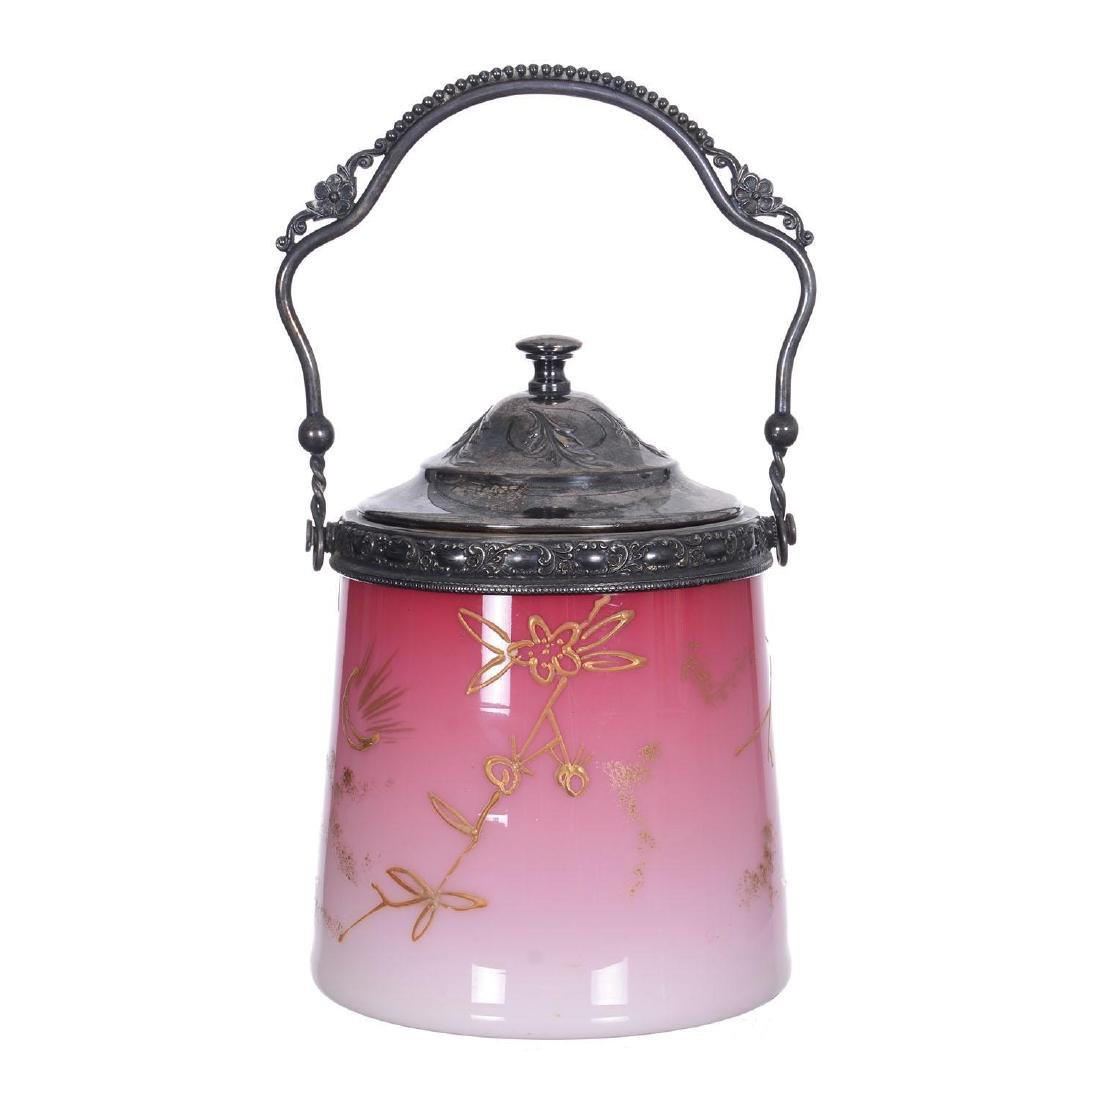 "7"" Cased Peachblow Art Glass Biscuit Jar"